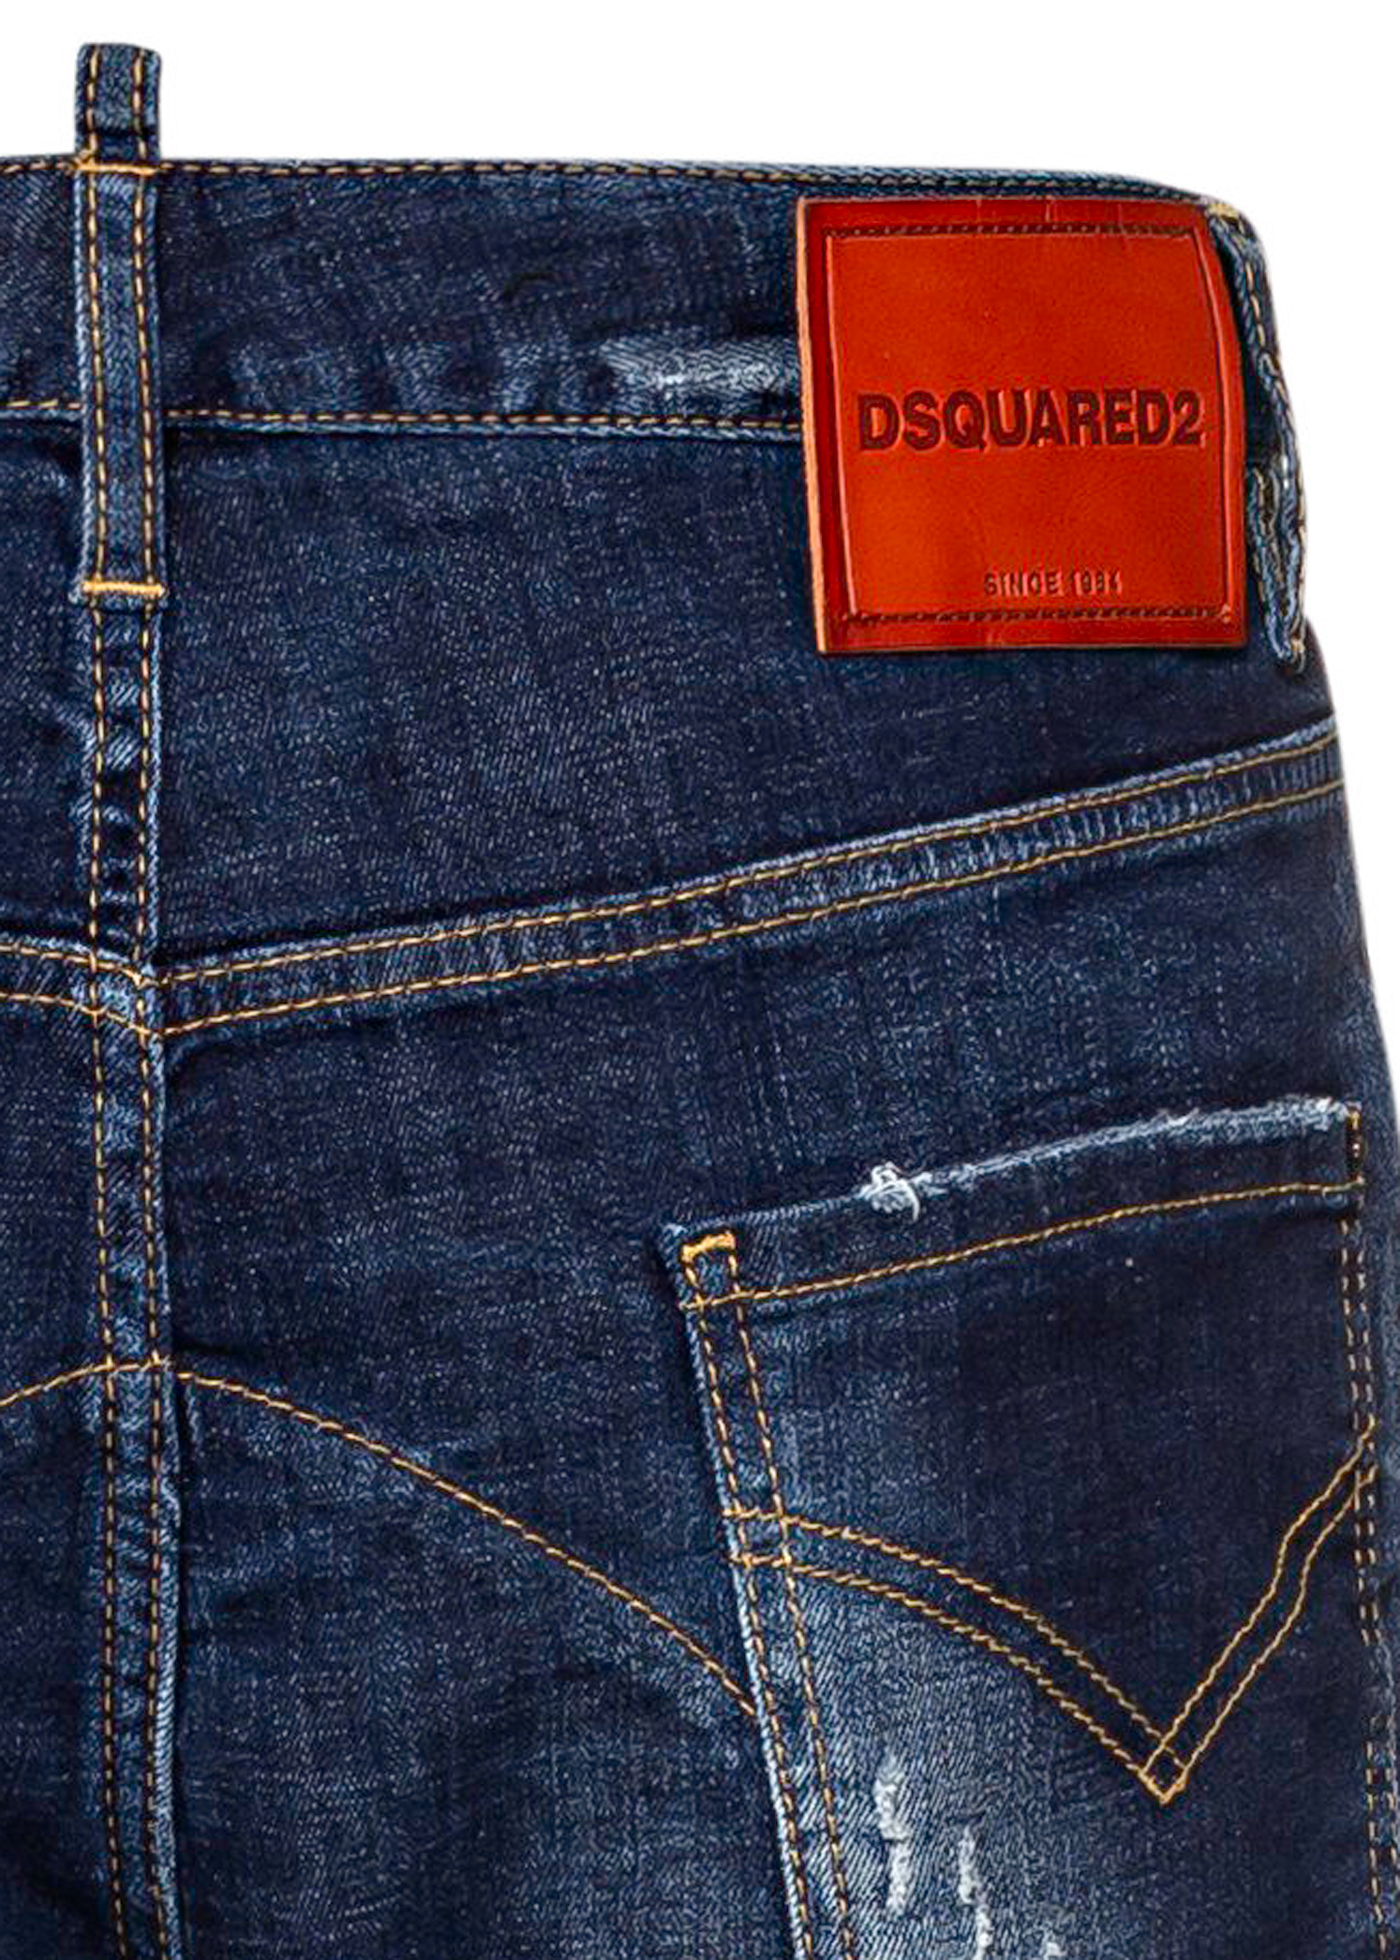 Combat Jeans image number 3